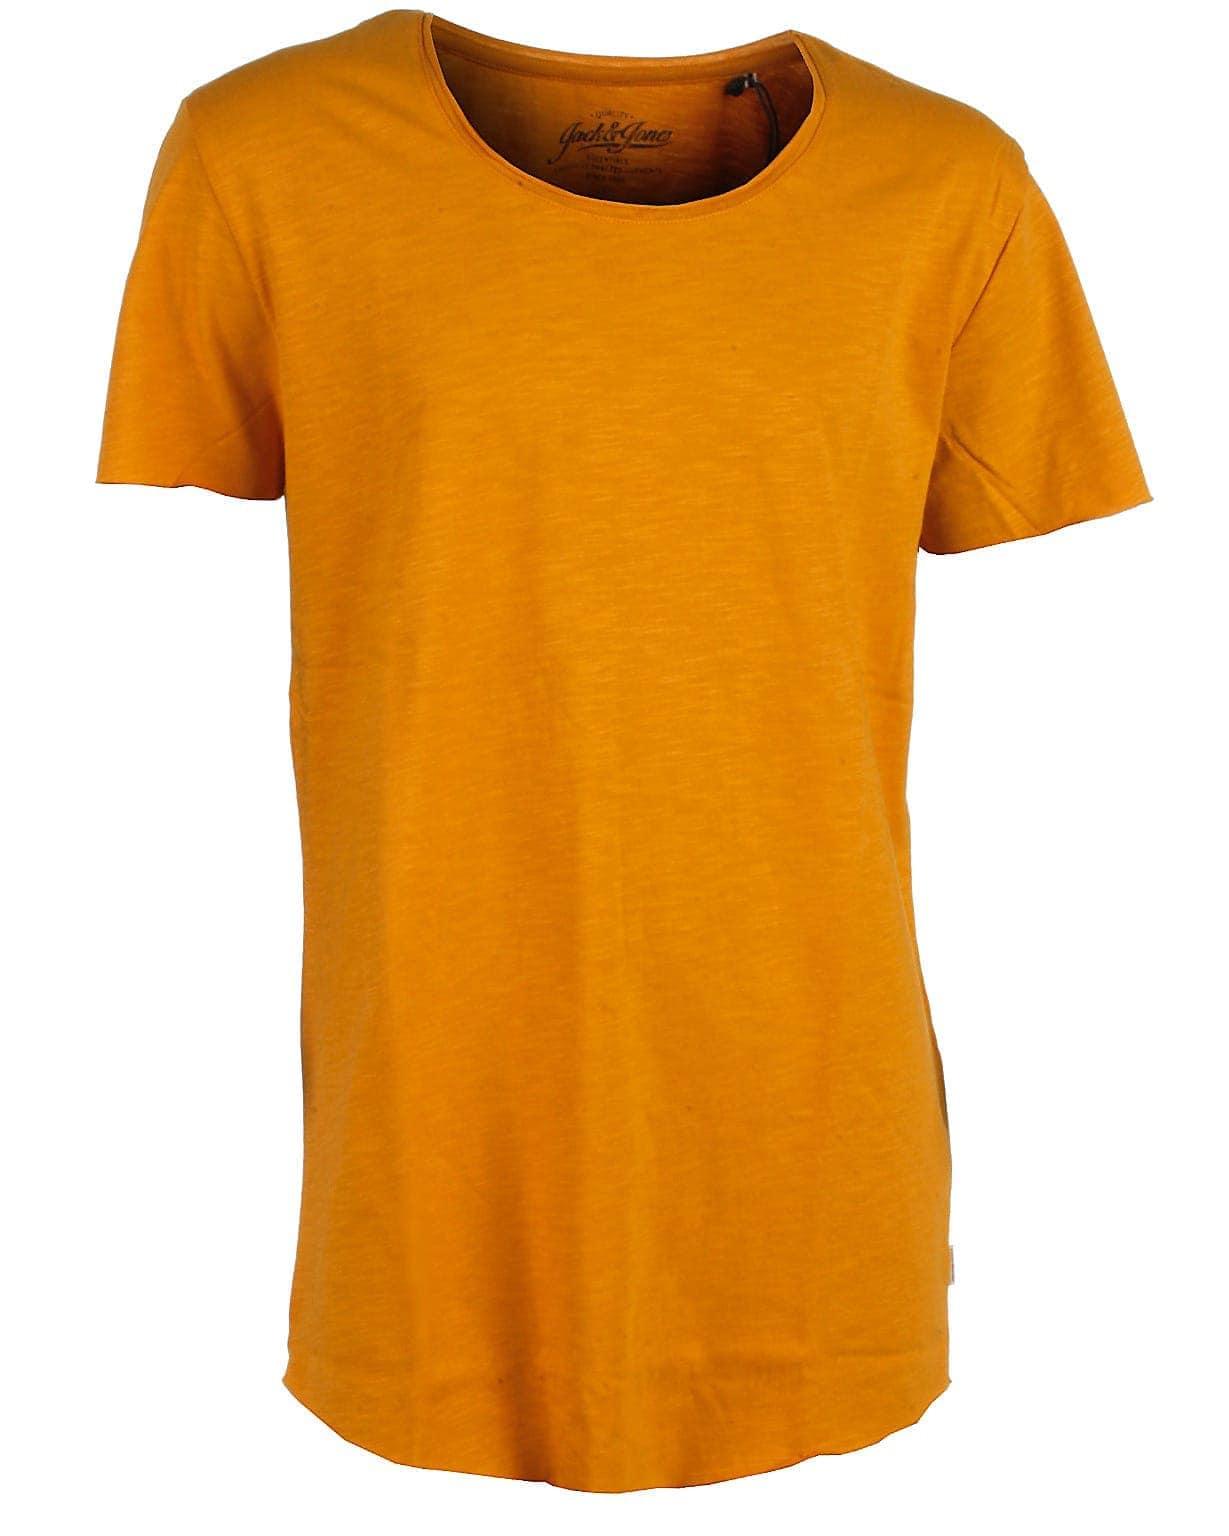 Image of Jack & Jones t-shirt s/s, gul, Bas